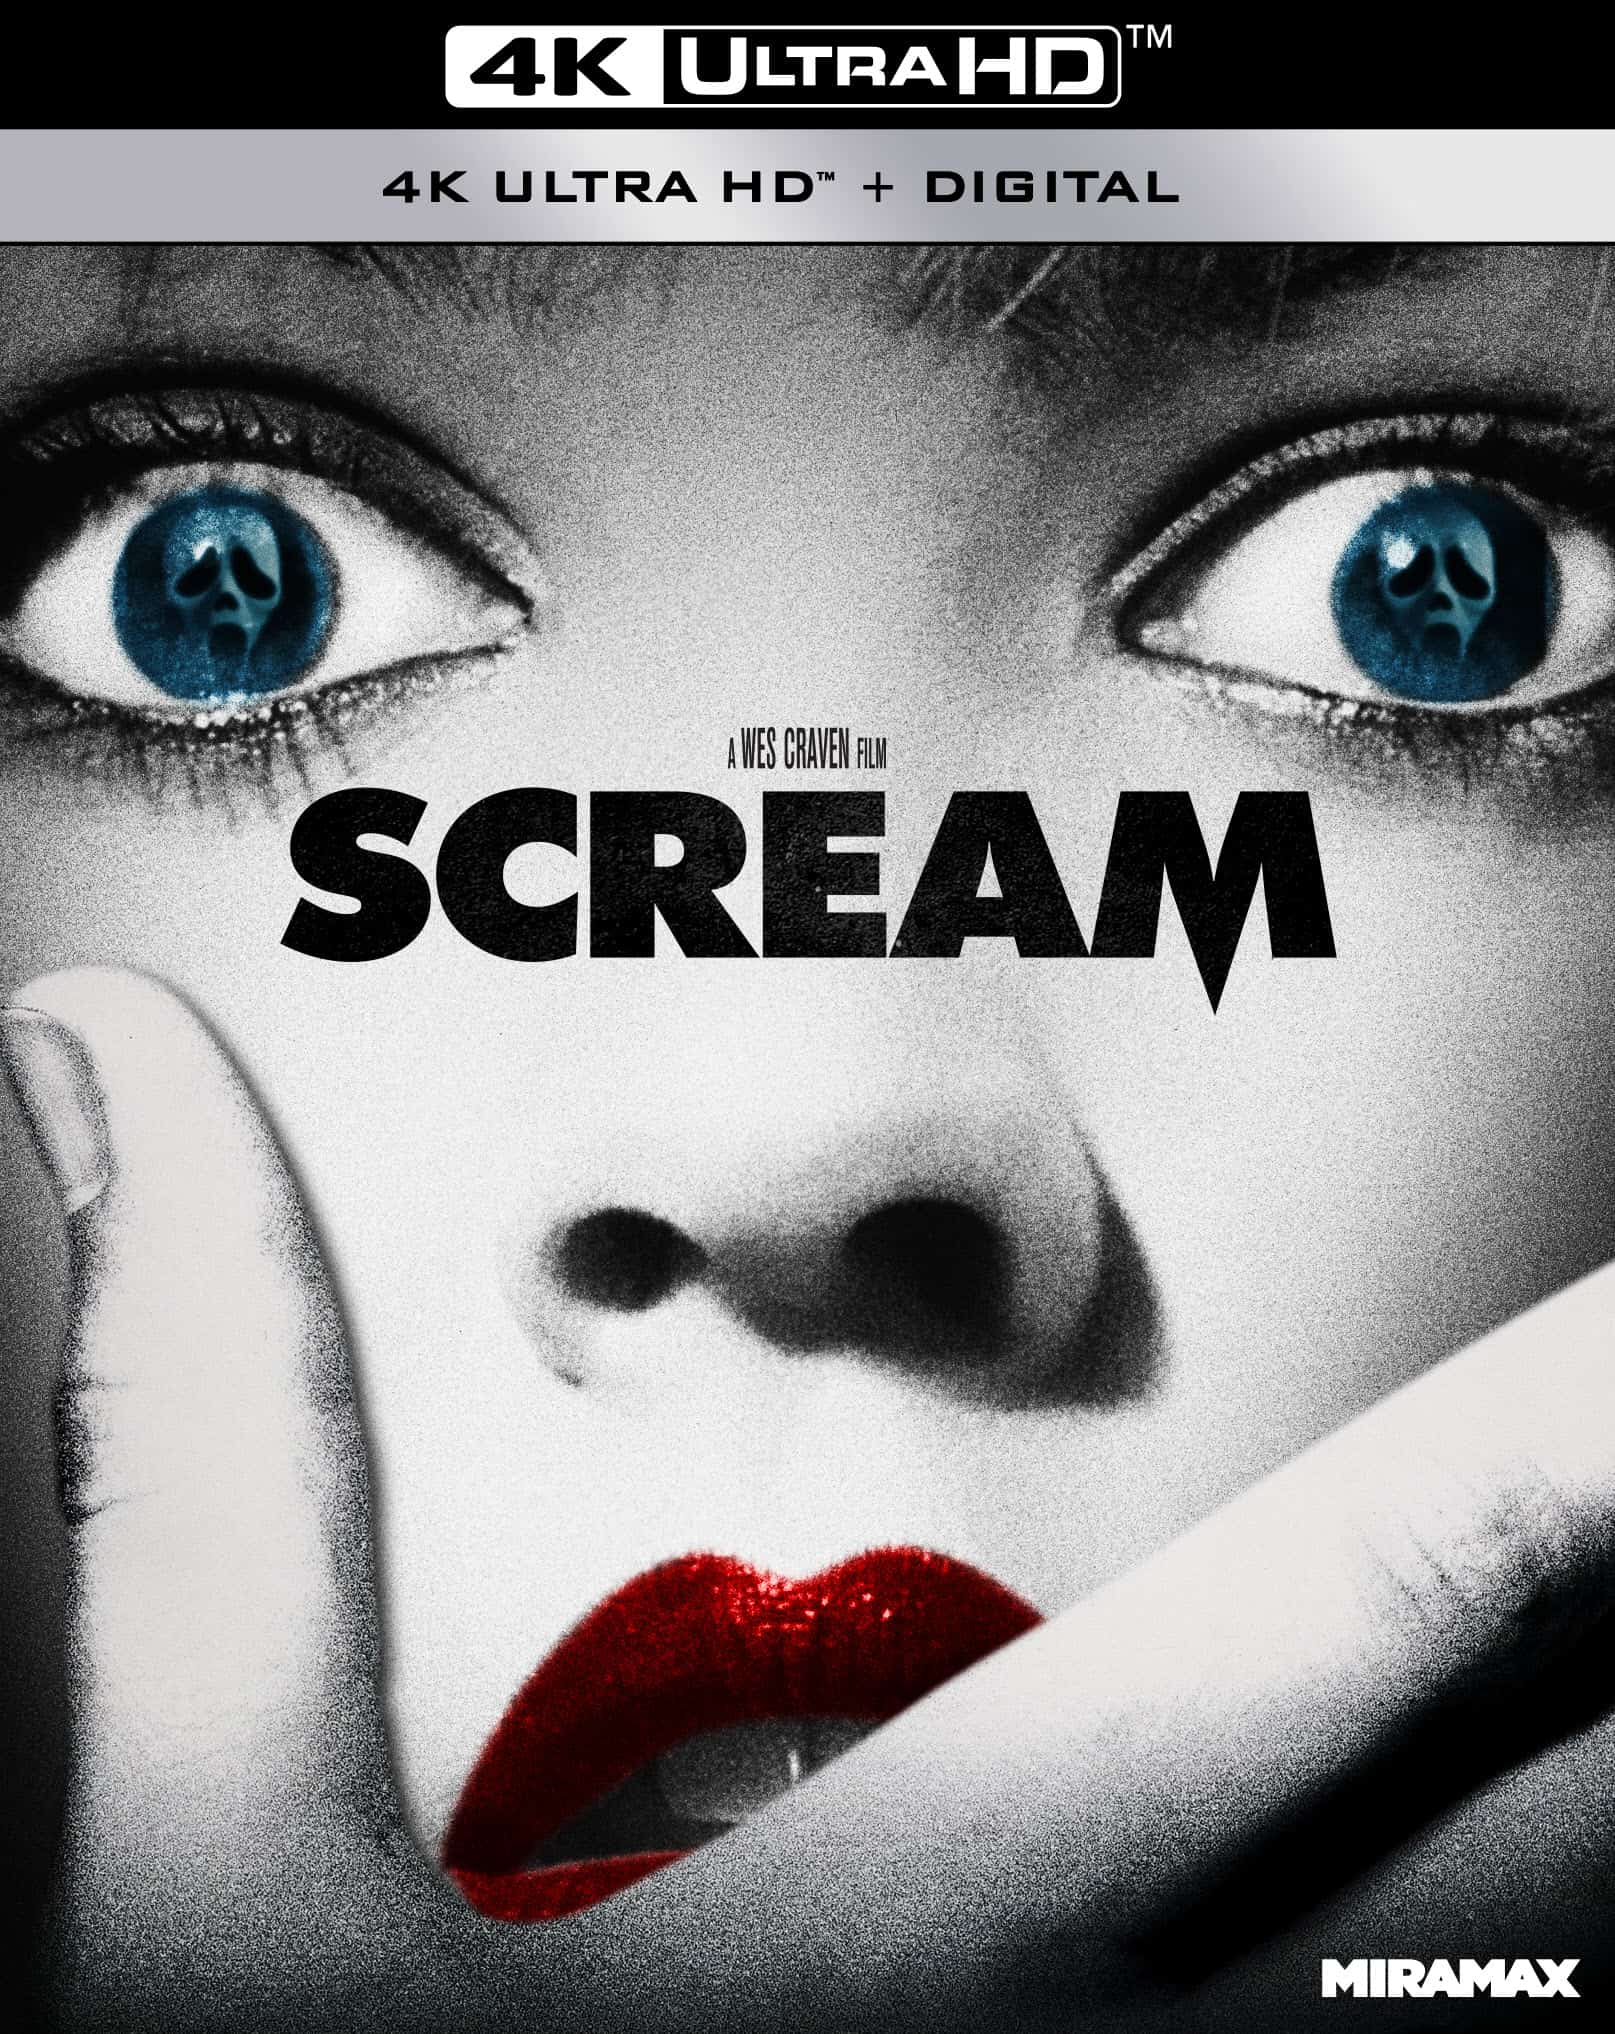 Scream (1996) Debuts On 4K Ultra HD October 19th 2